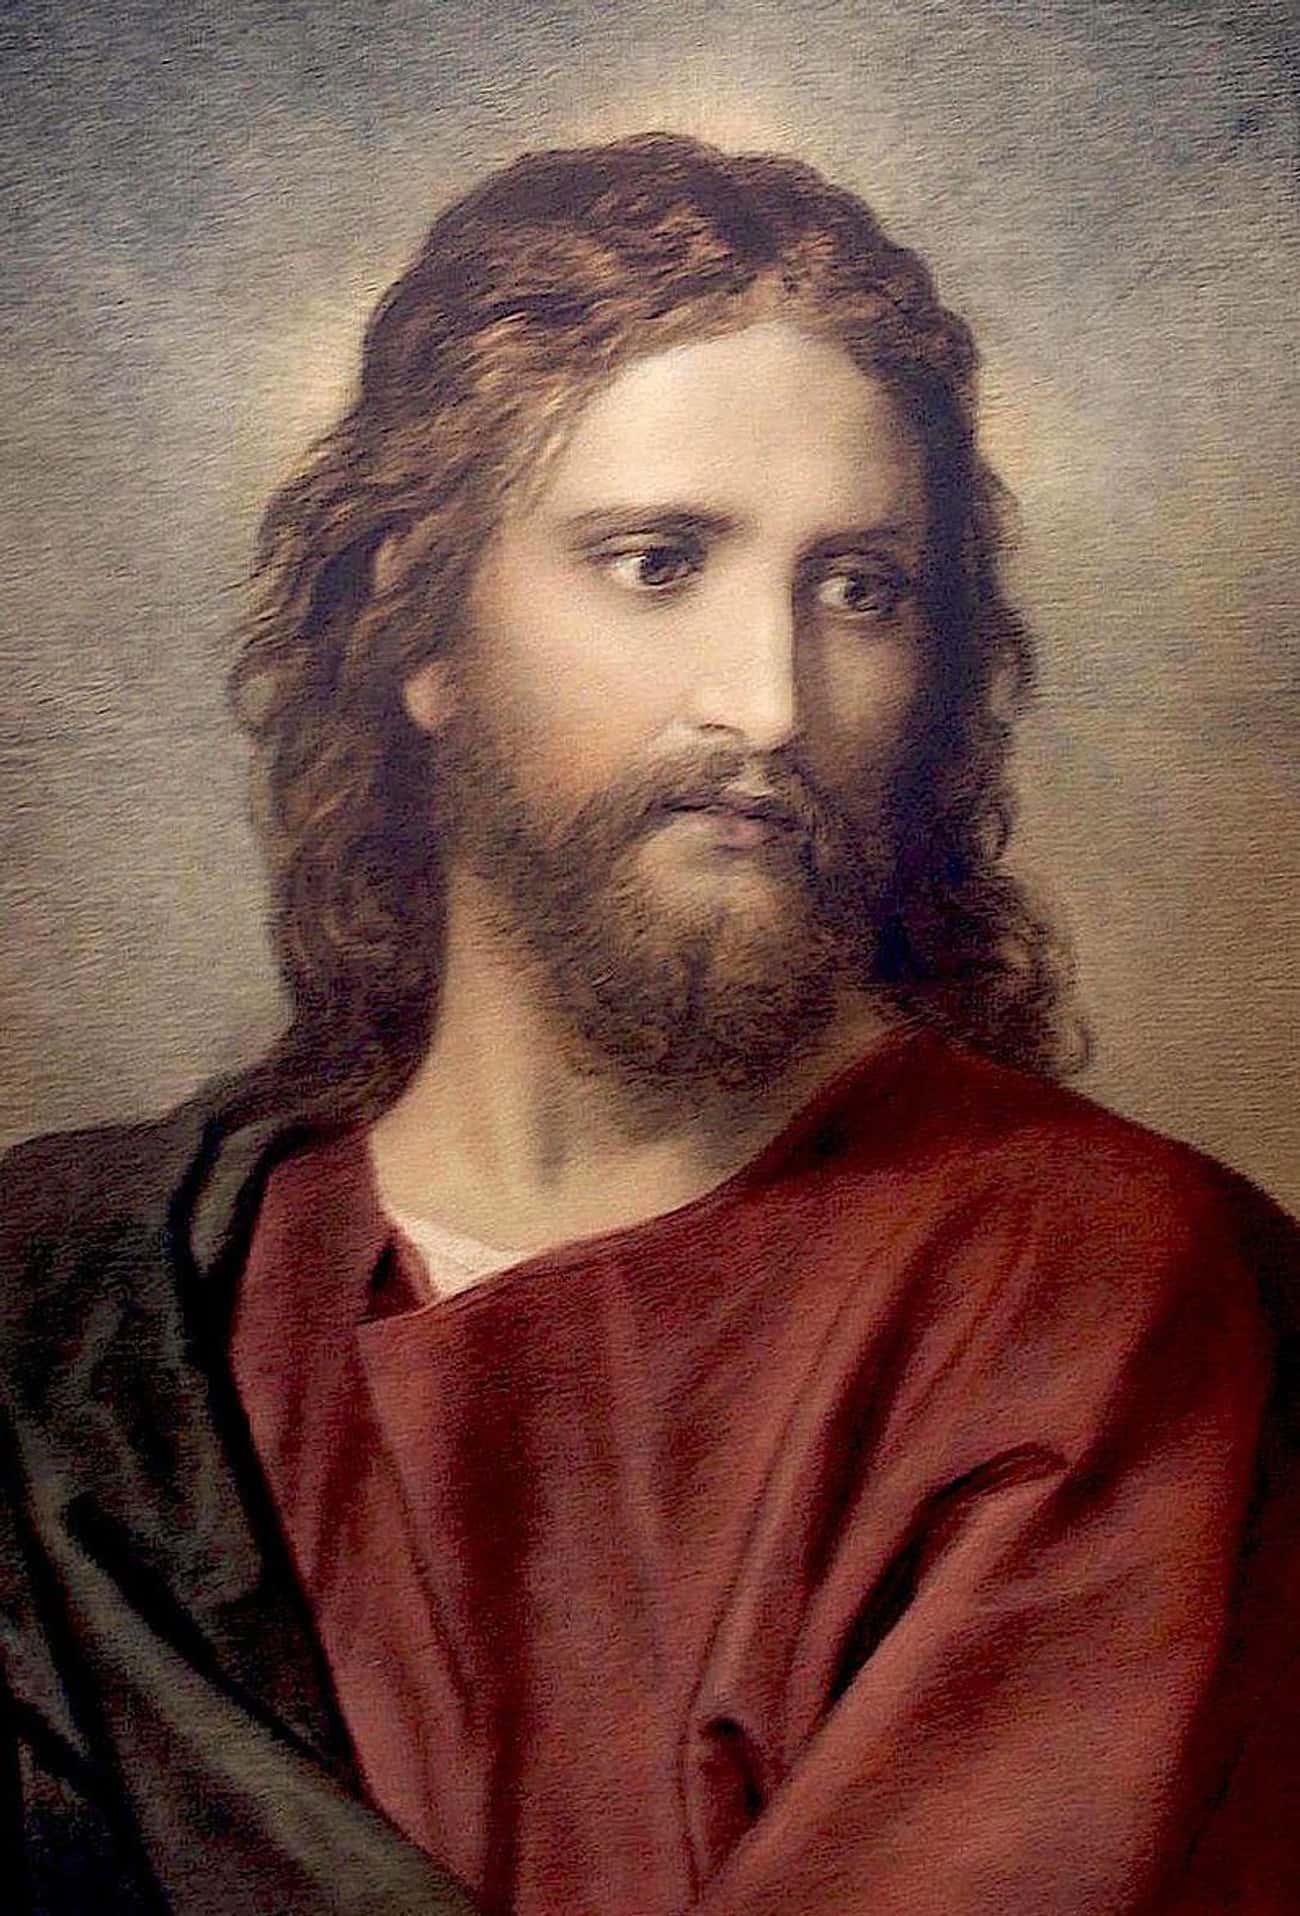 Annoy Jesus